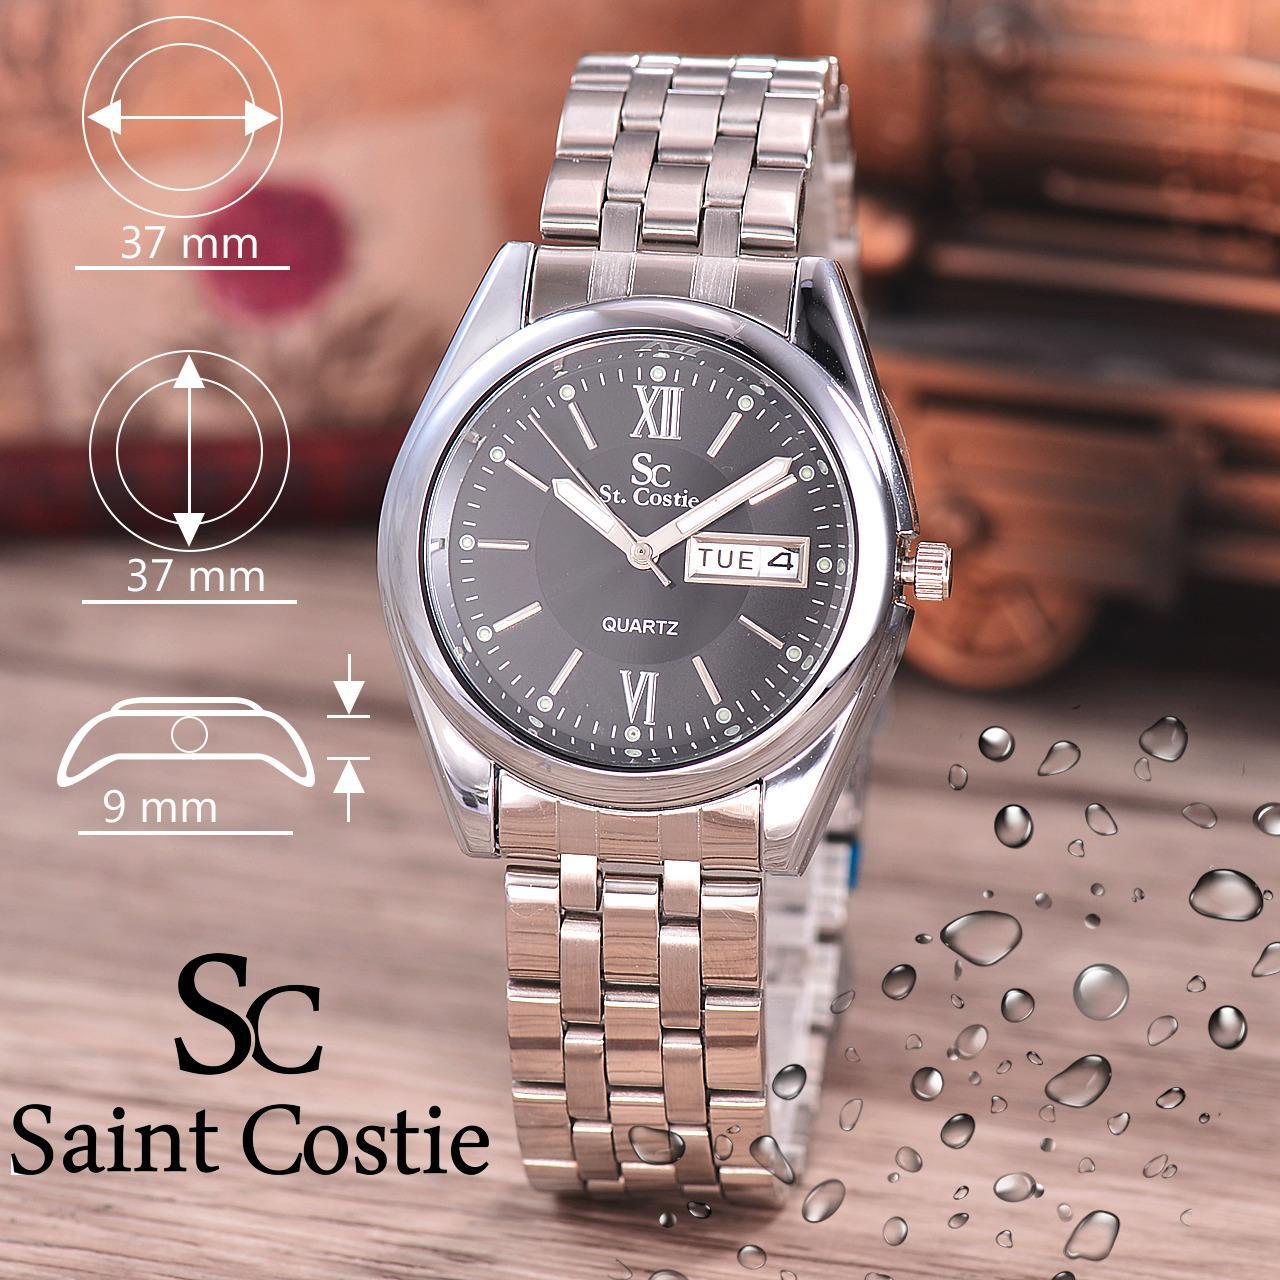 Harga Saint Costie Original Brand Jam Tangan Pria Body Silver Black Dial Stainless Stell Band Sc Rt 5236B G Wb Th Yang Bagus